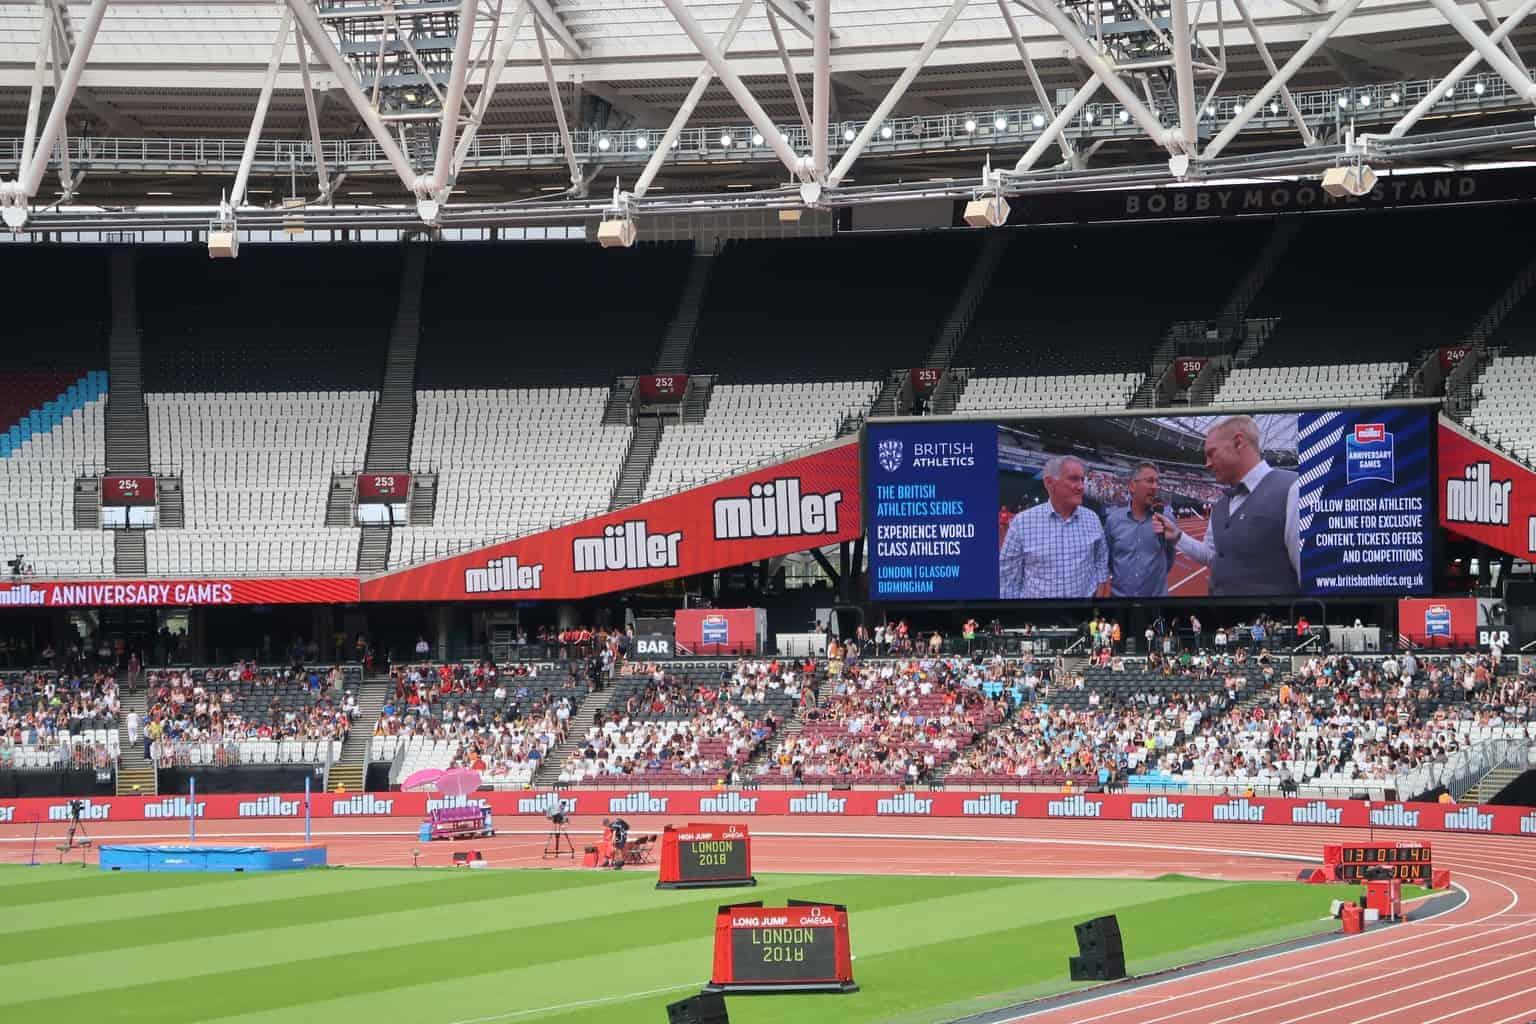 The Muller Anniversary Games inspiring the next generation of sport superstars